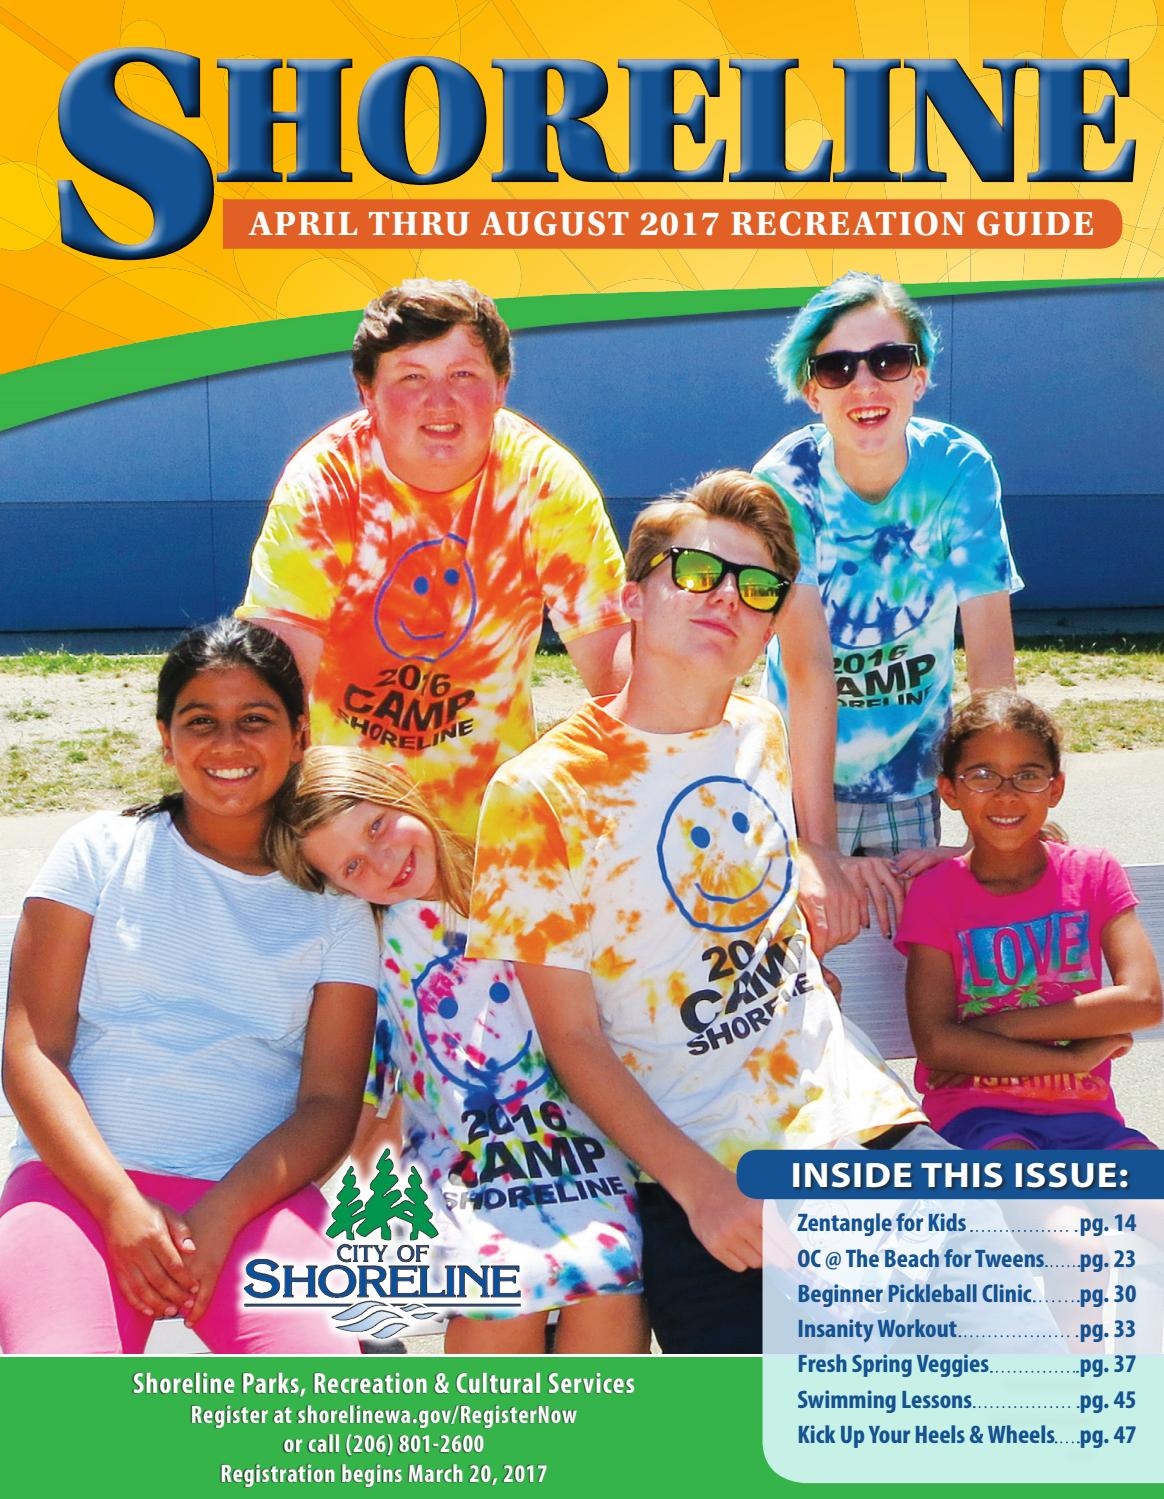 5c05cf9ee90d Shoreline spring summer recreation guide 2017 by City of Shoreline ...